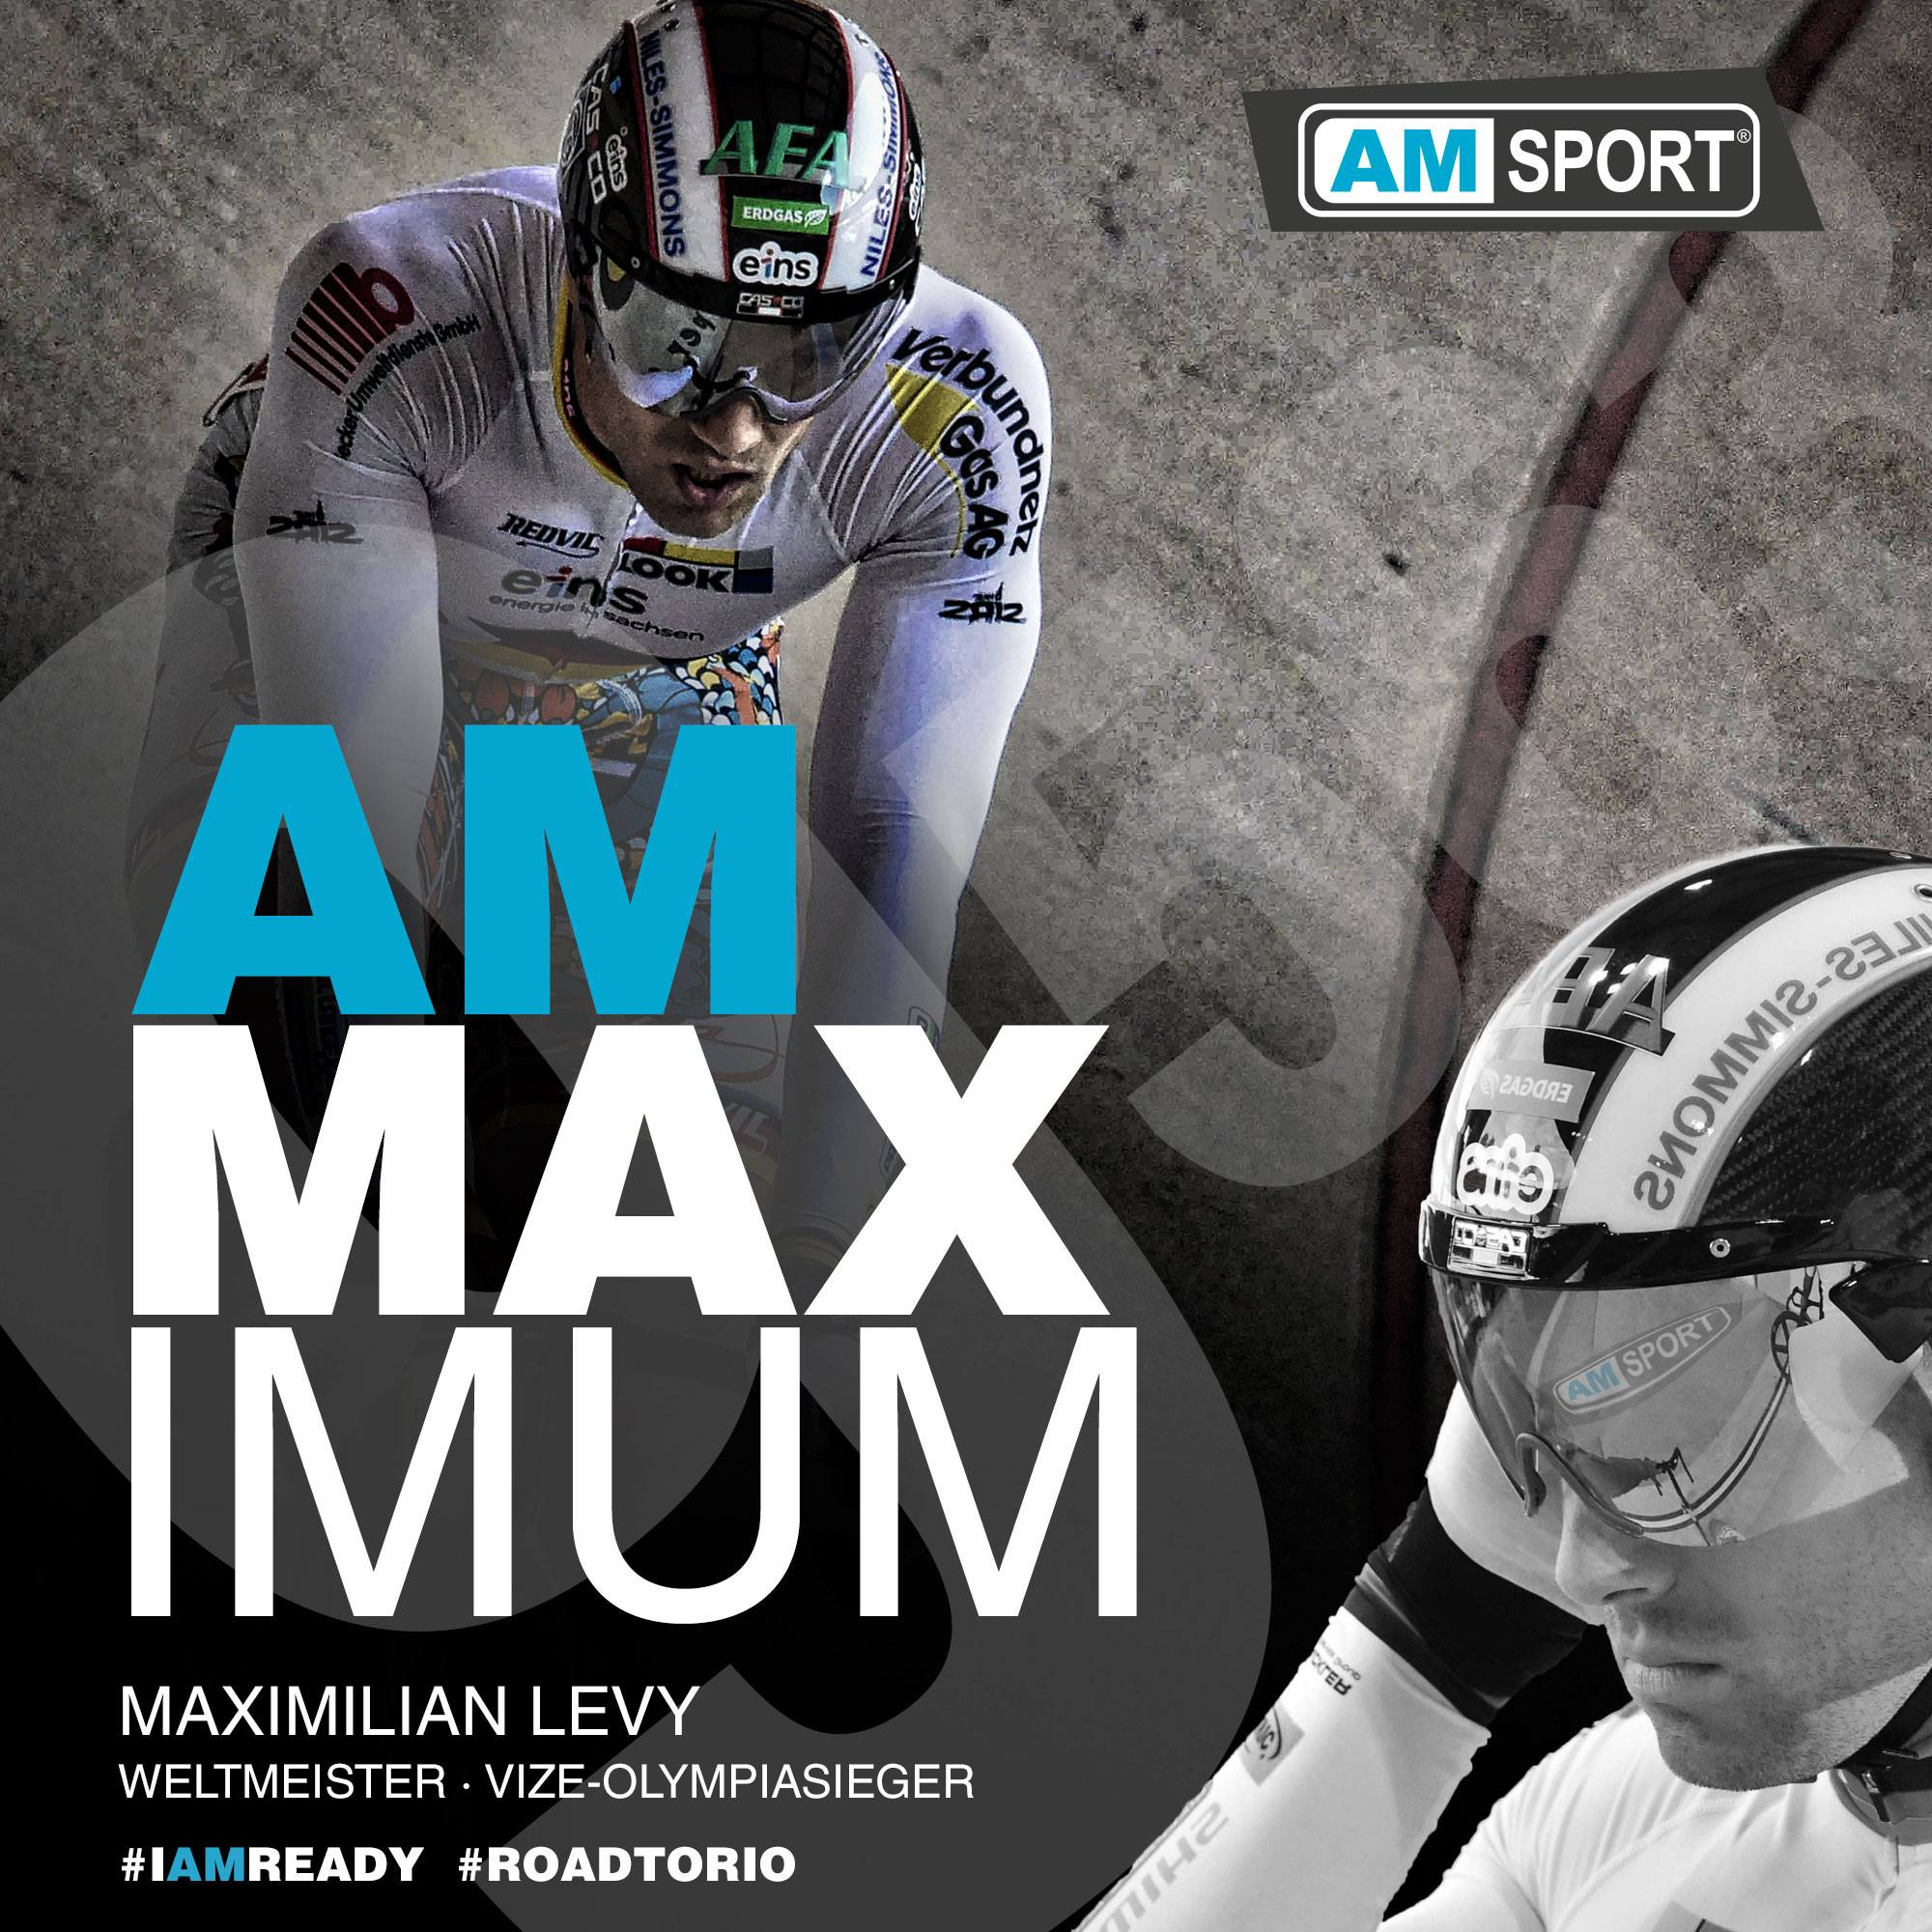 maximilian-levy-ciclismo.jpg